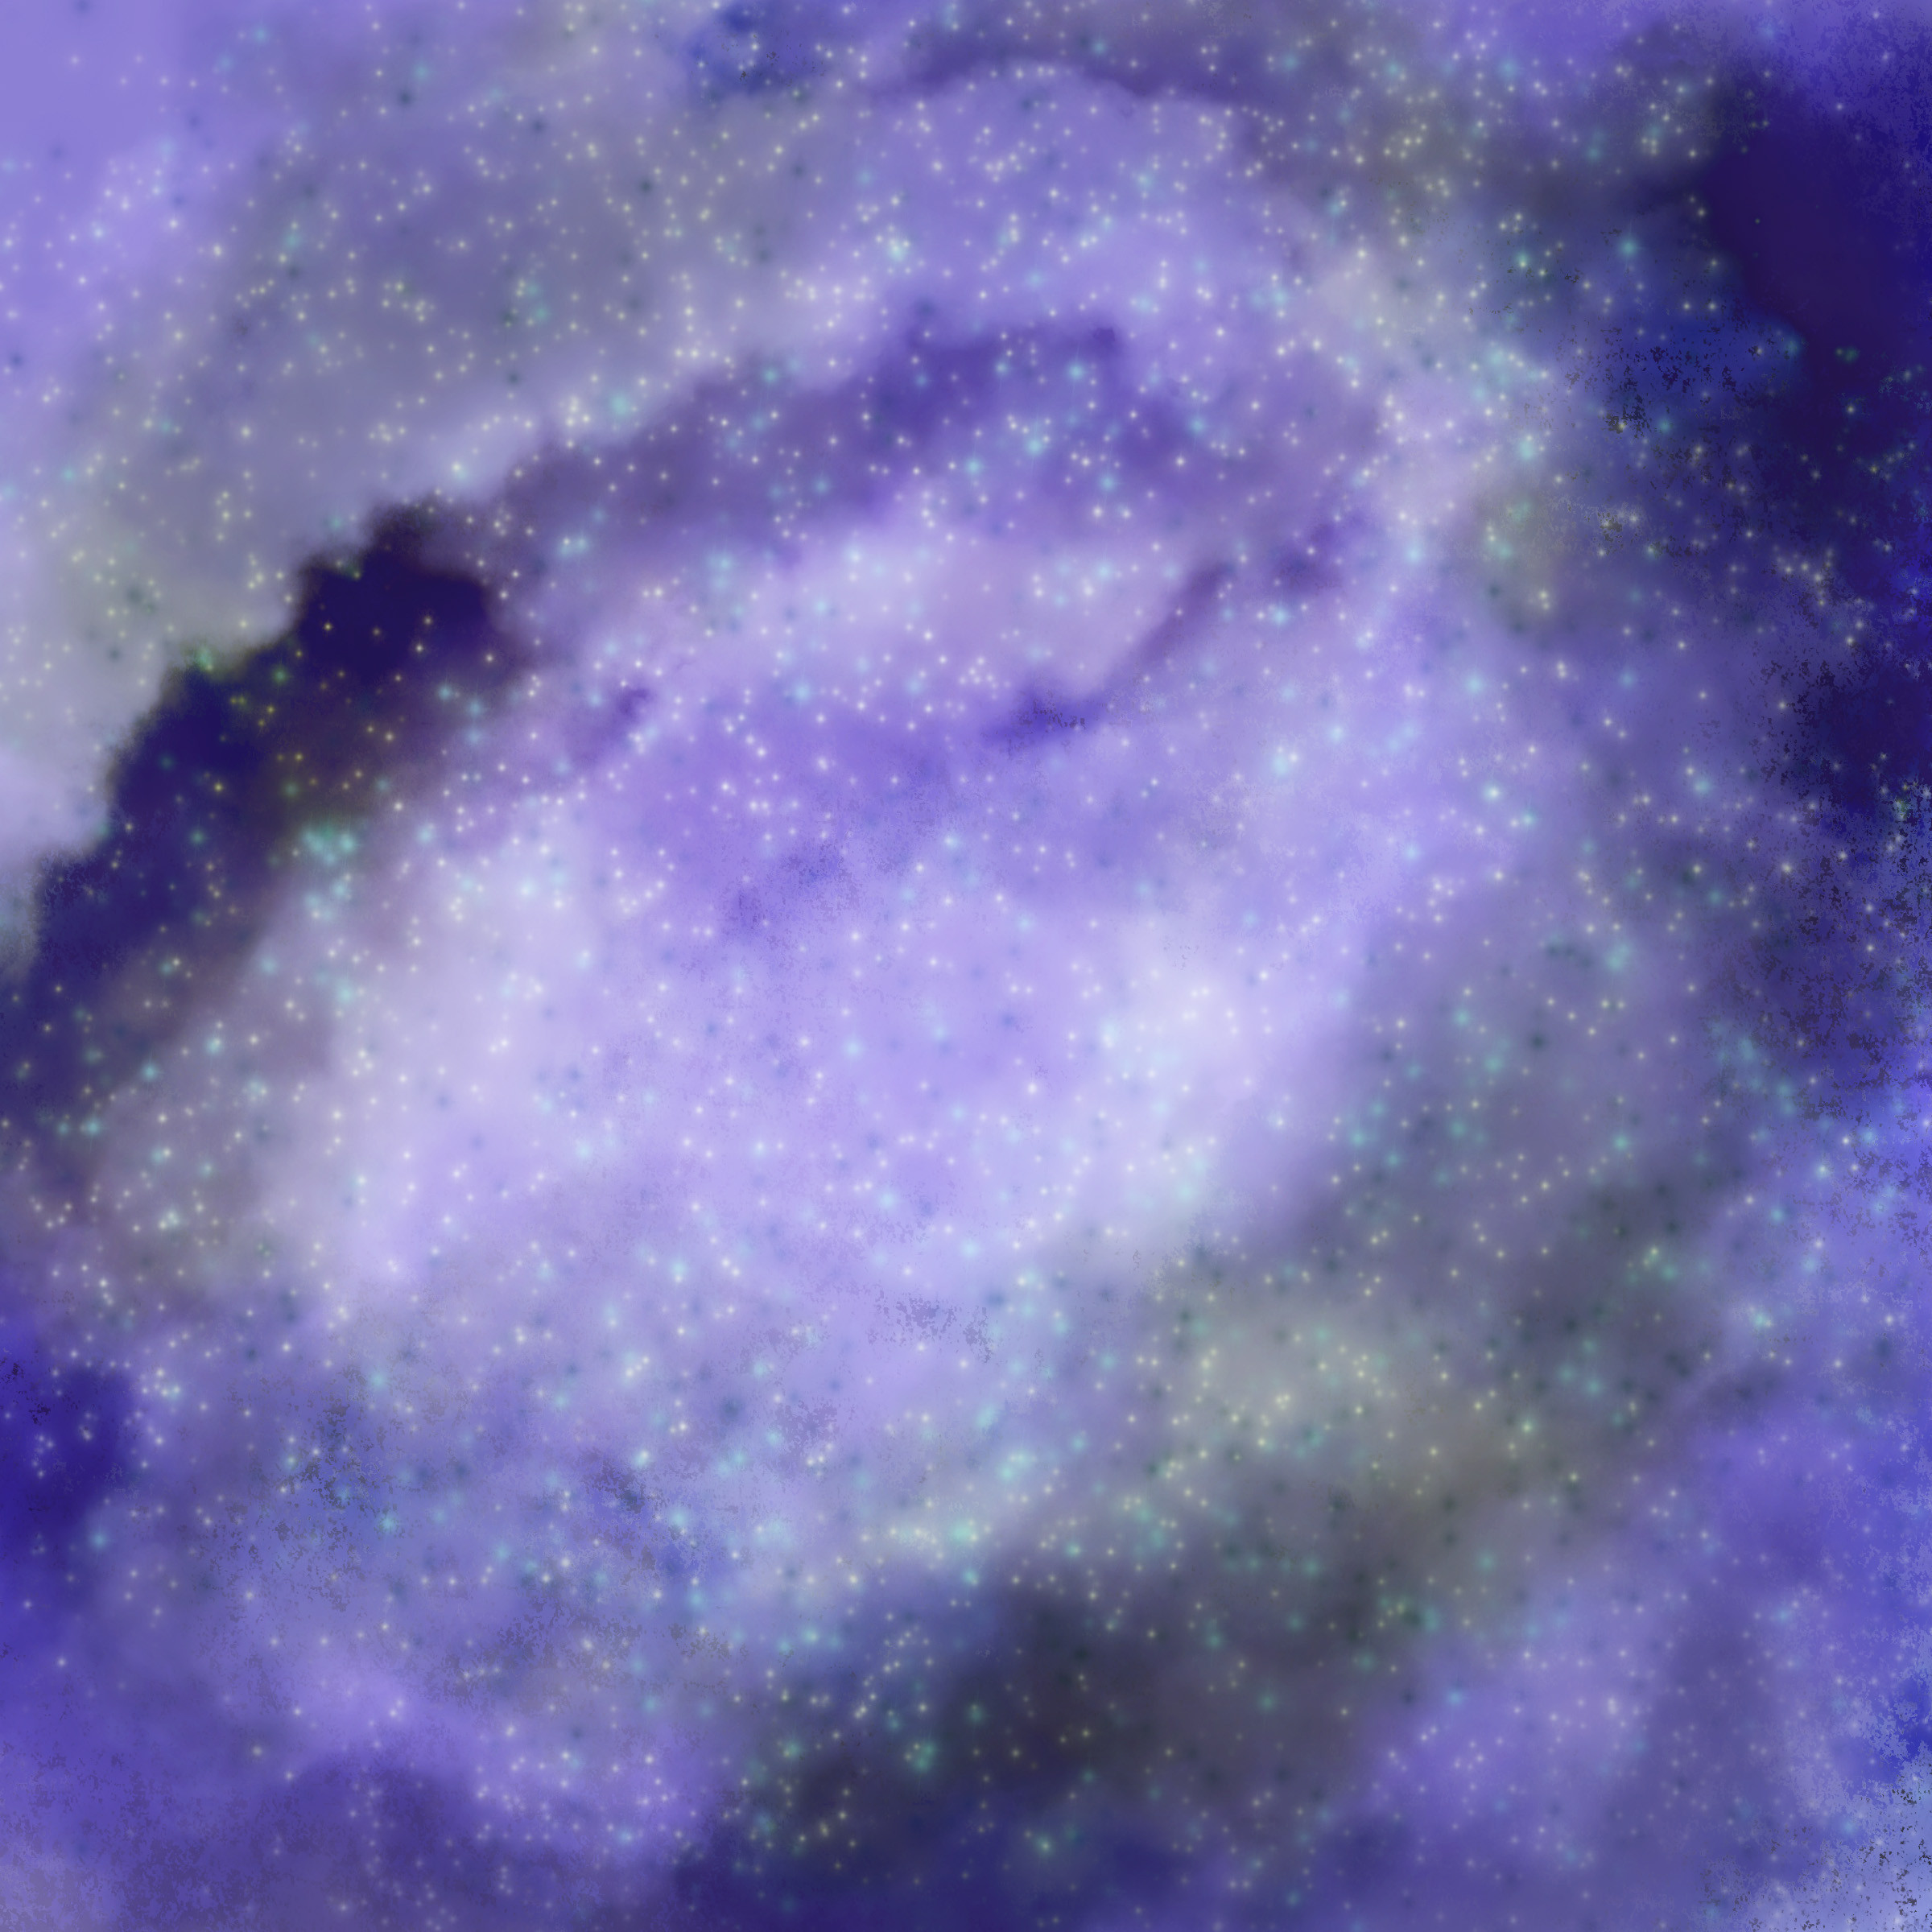 Star study 15